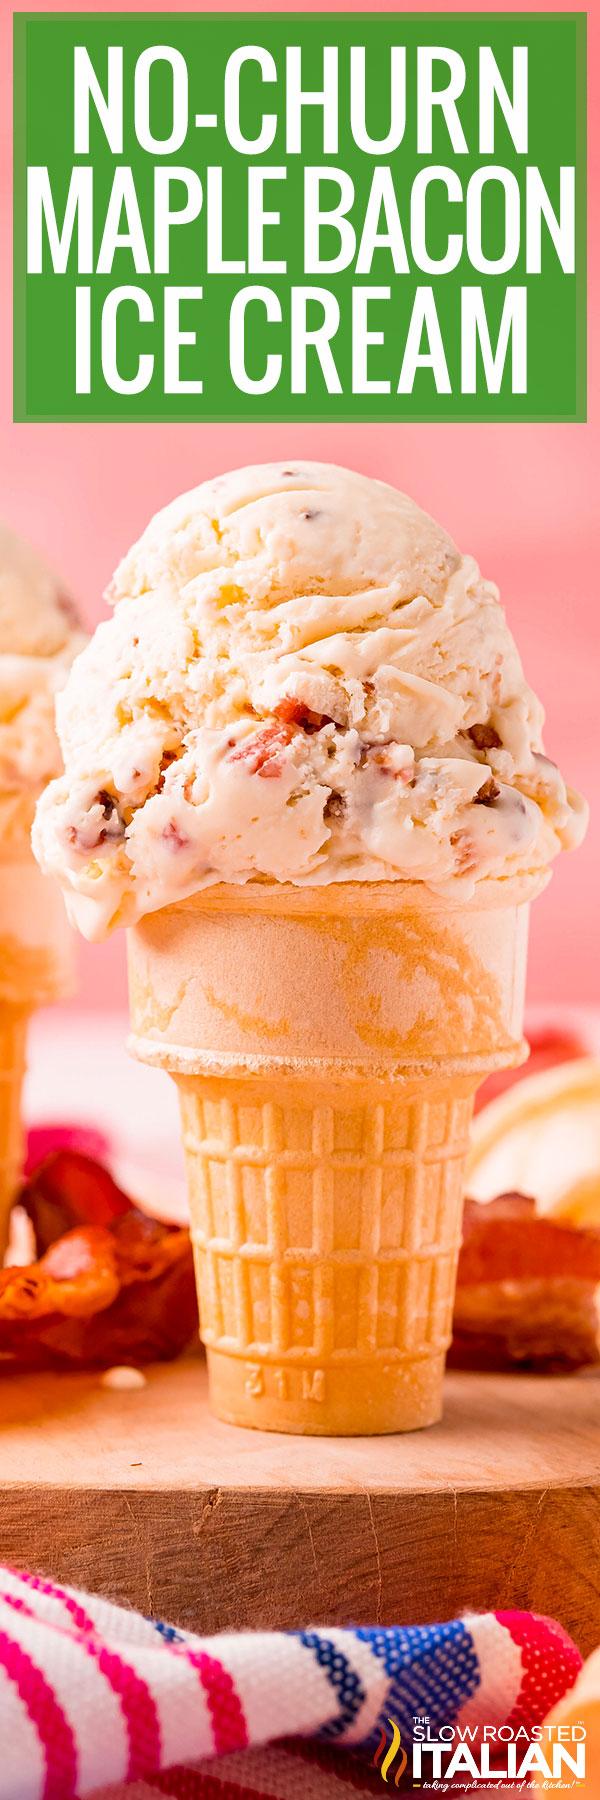 No-Churn Maple Bacon Ice Cream close up